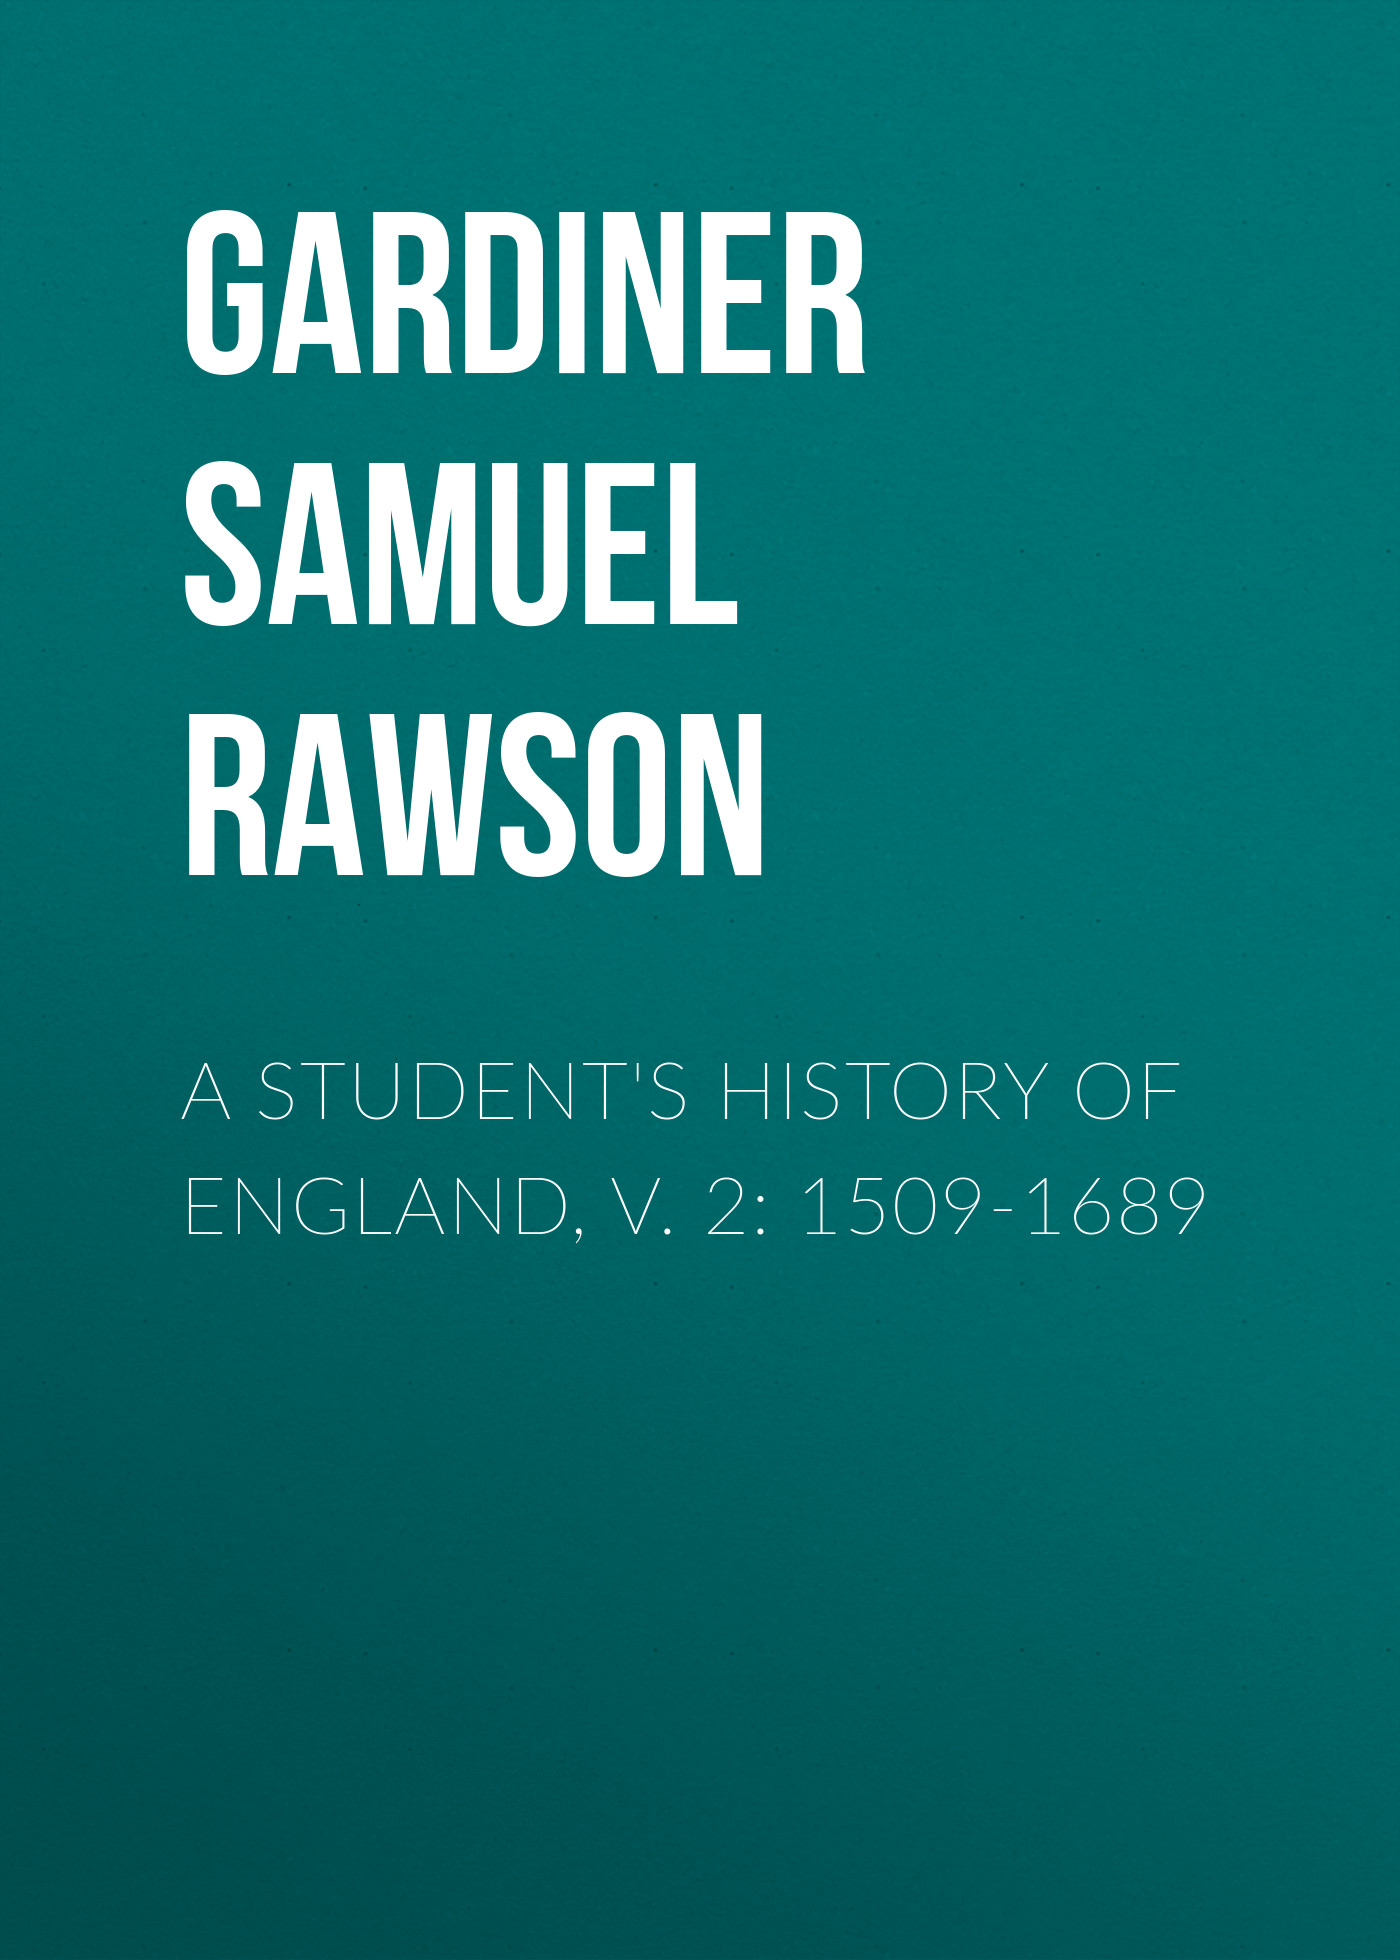 Gardiner Samuel Rawson A Student's History of England, v. 2: 1509-1689 gardiner samuel rawson what gunpowder plot was